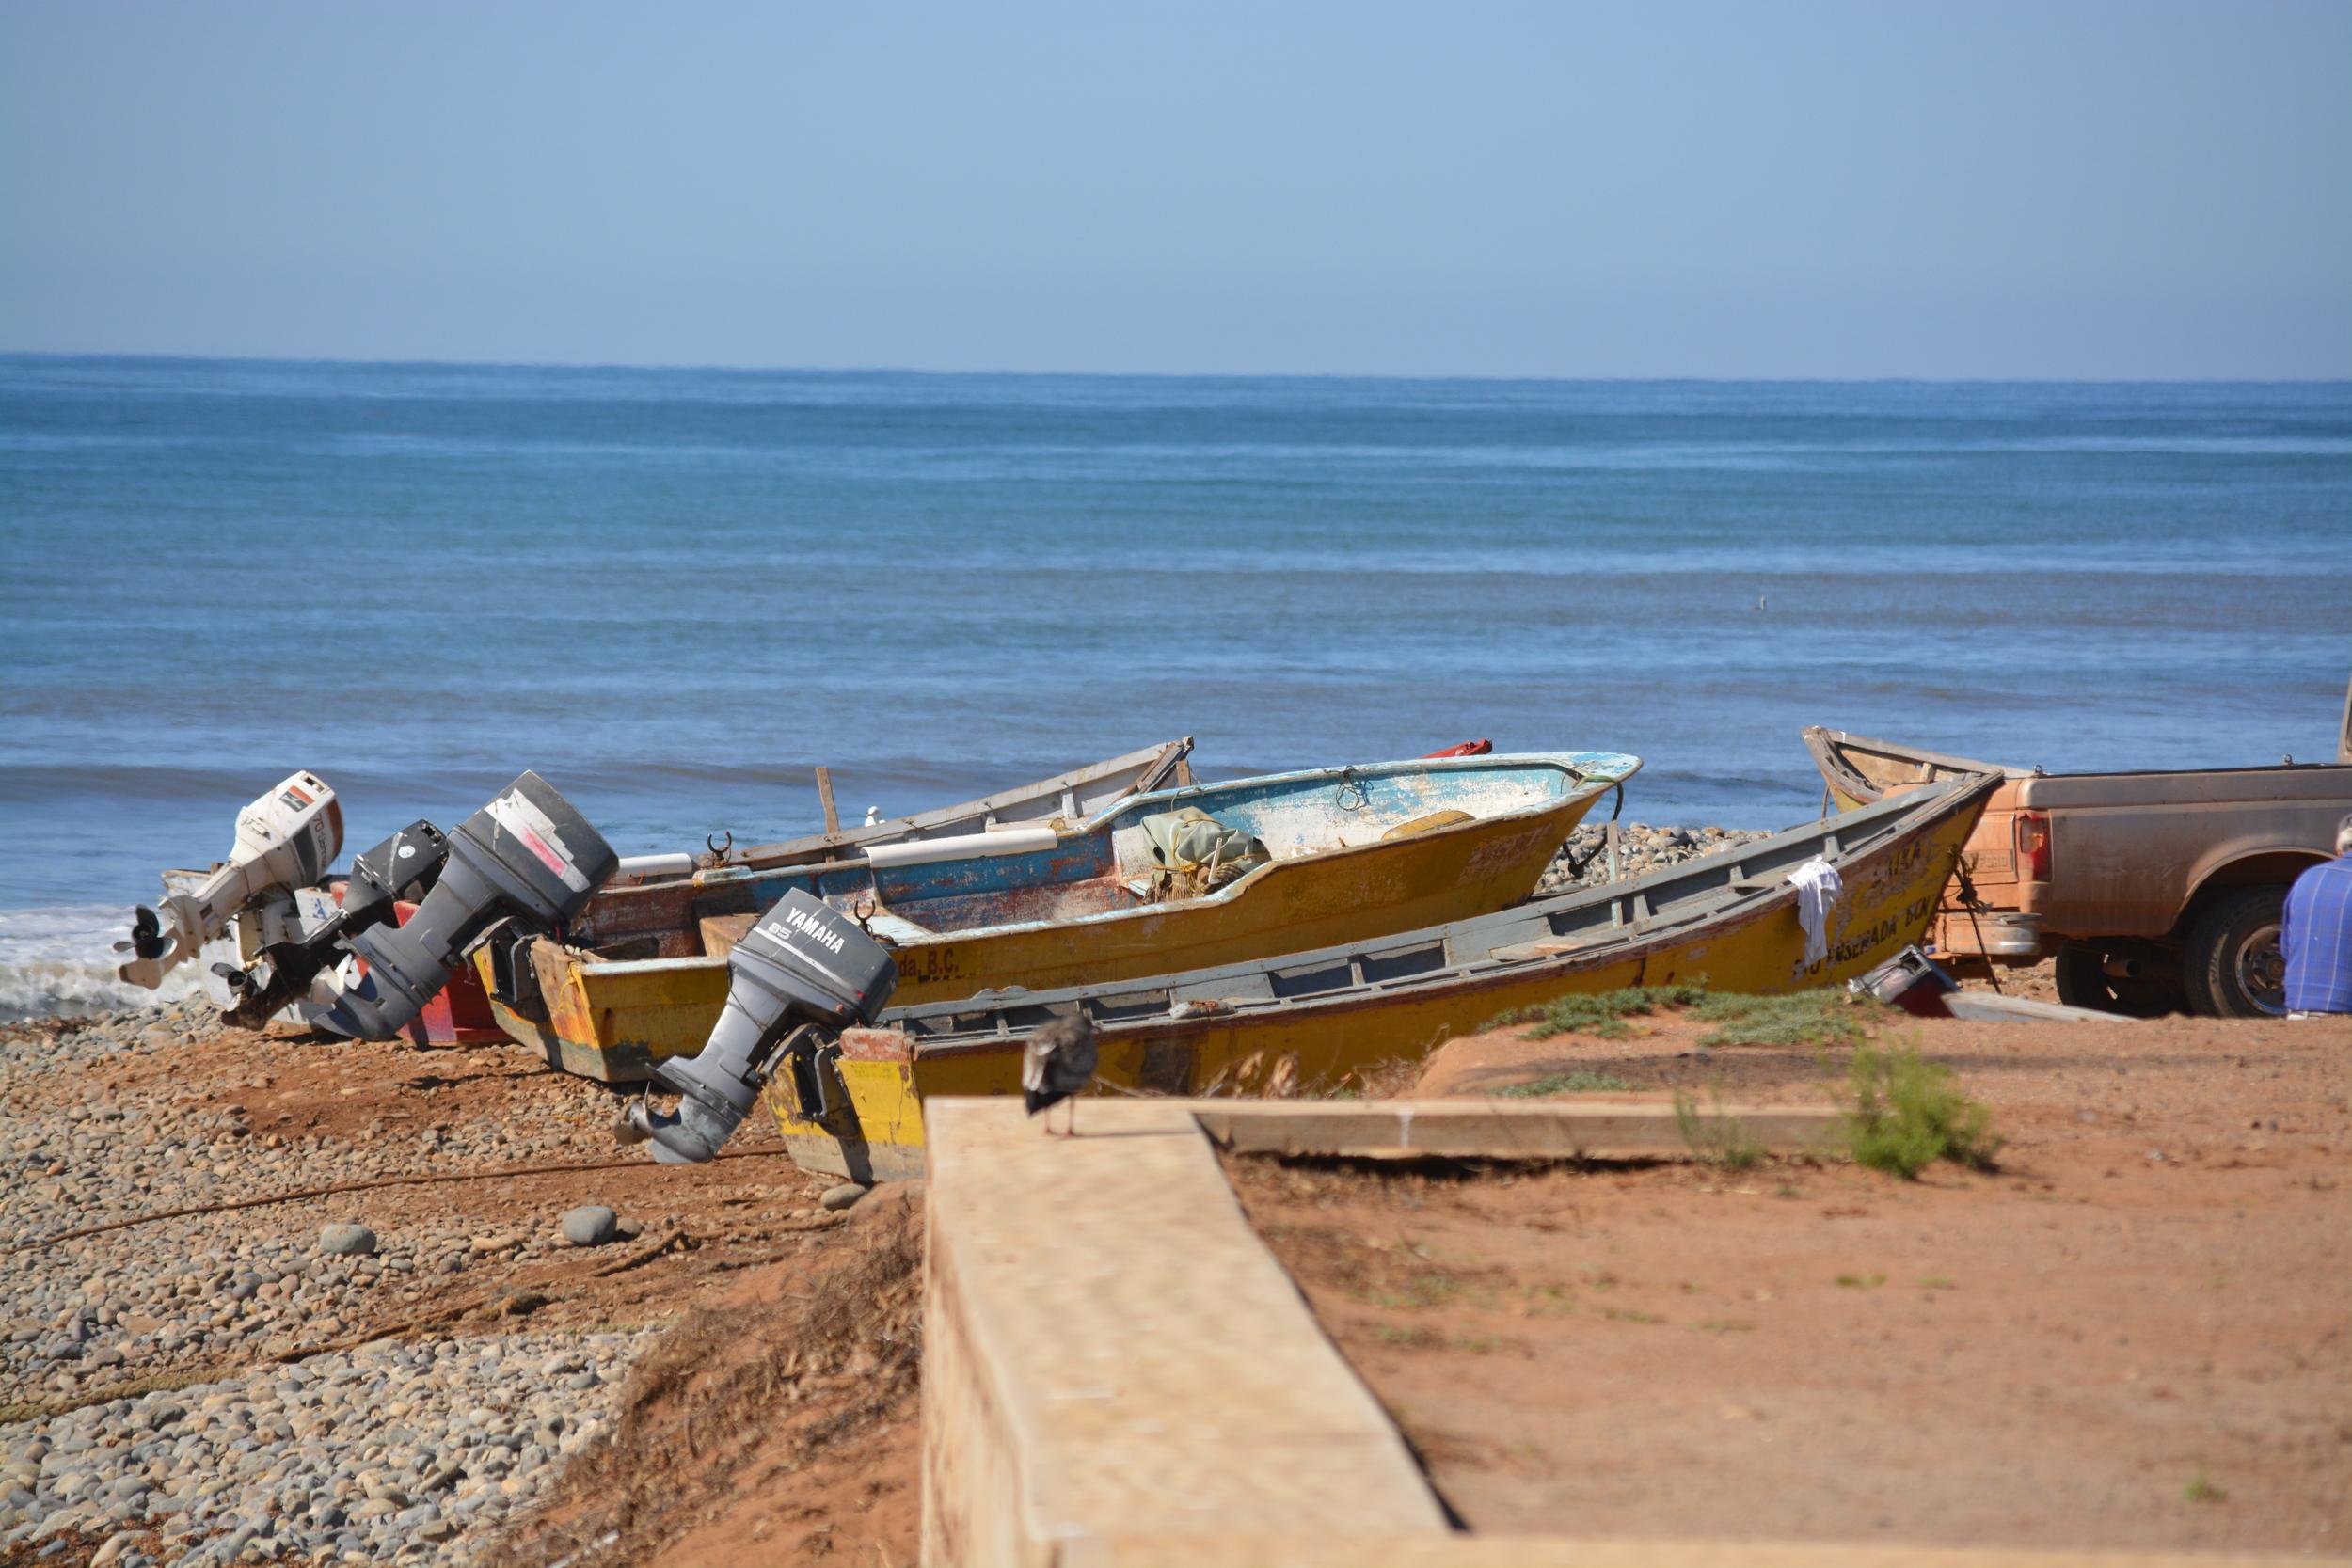 Baja California 10-5-13 Shipwrecks Surfing Adventure Ocean Experience Surf School San Diego (60).JPG